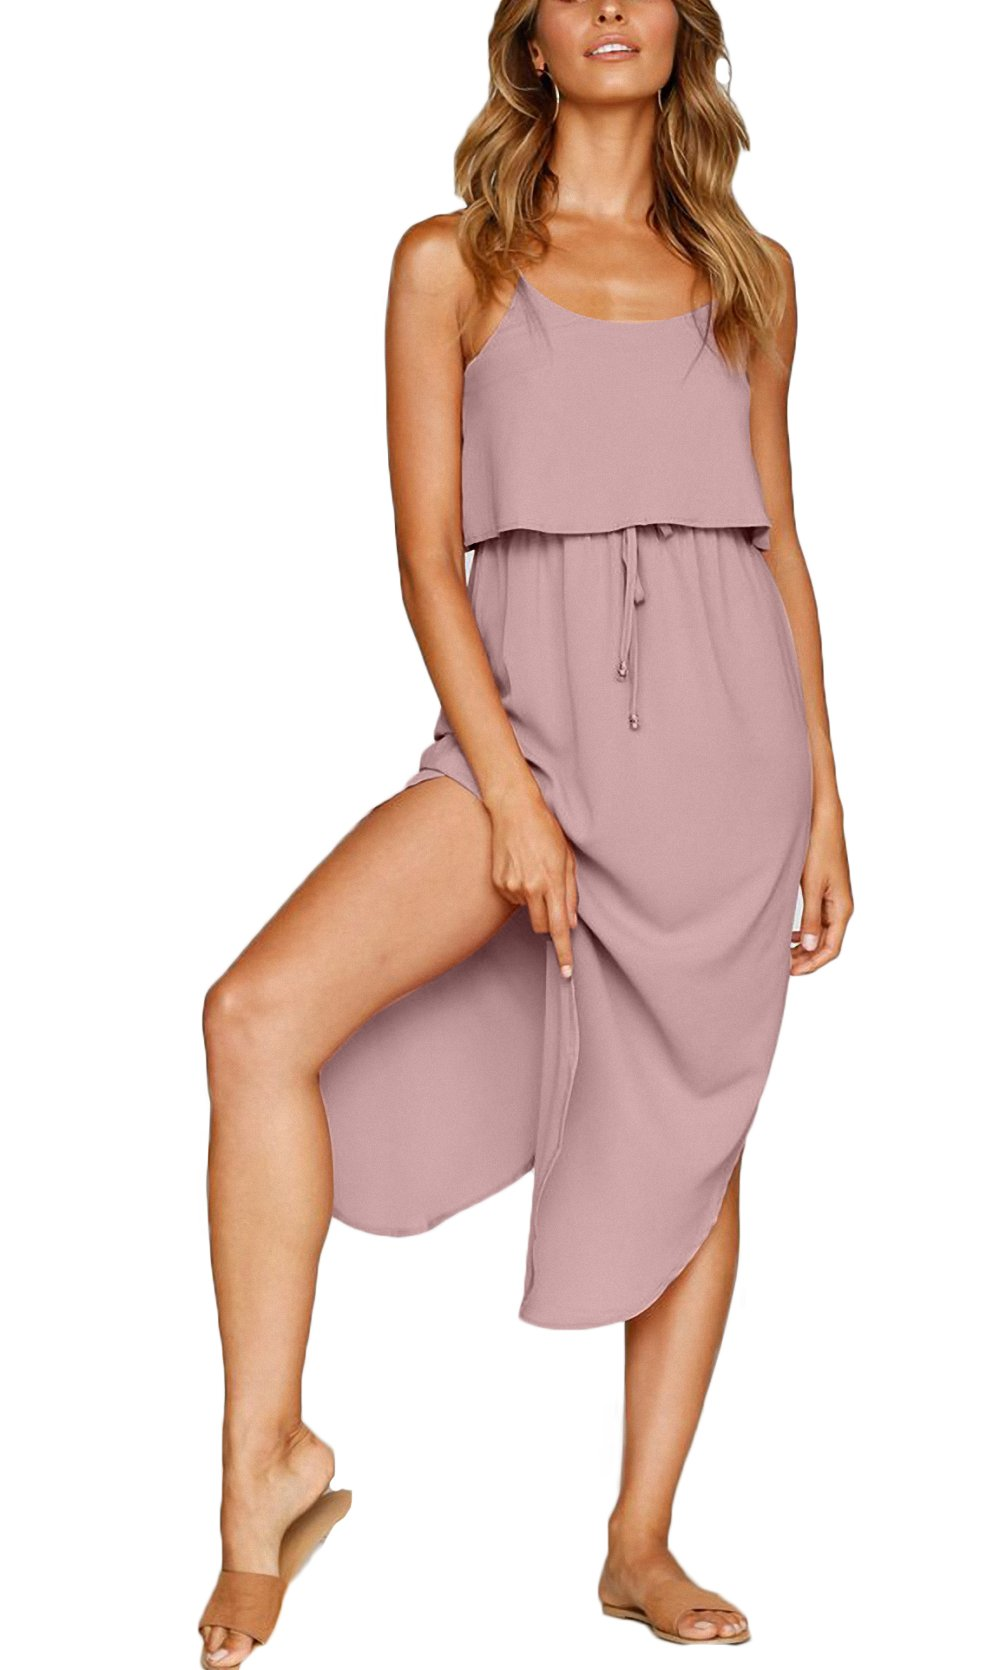 NERLEROLIAN Women's Adjustable Strappy Split Summer Beach Casual Midi Dress(shenfen,M)